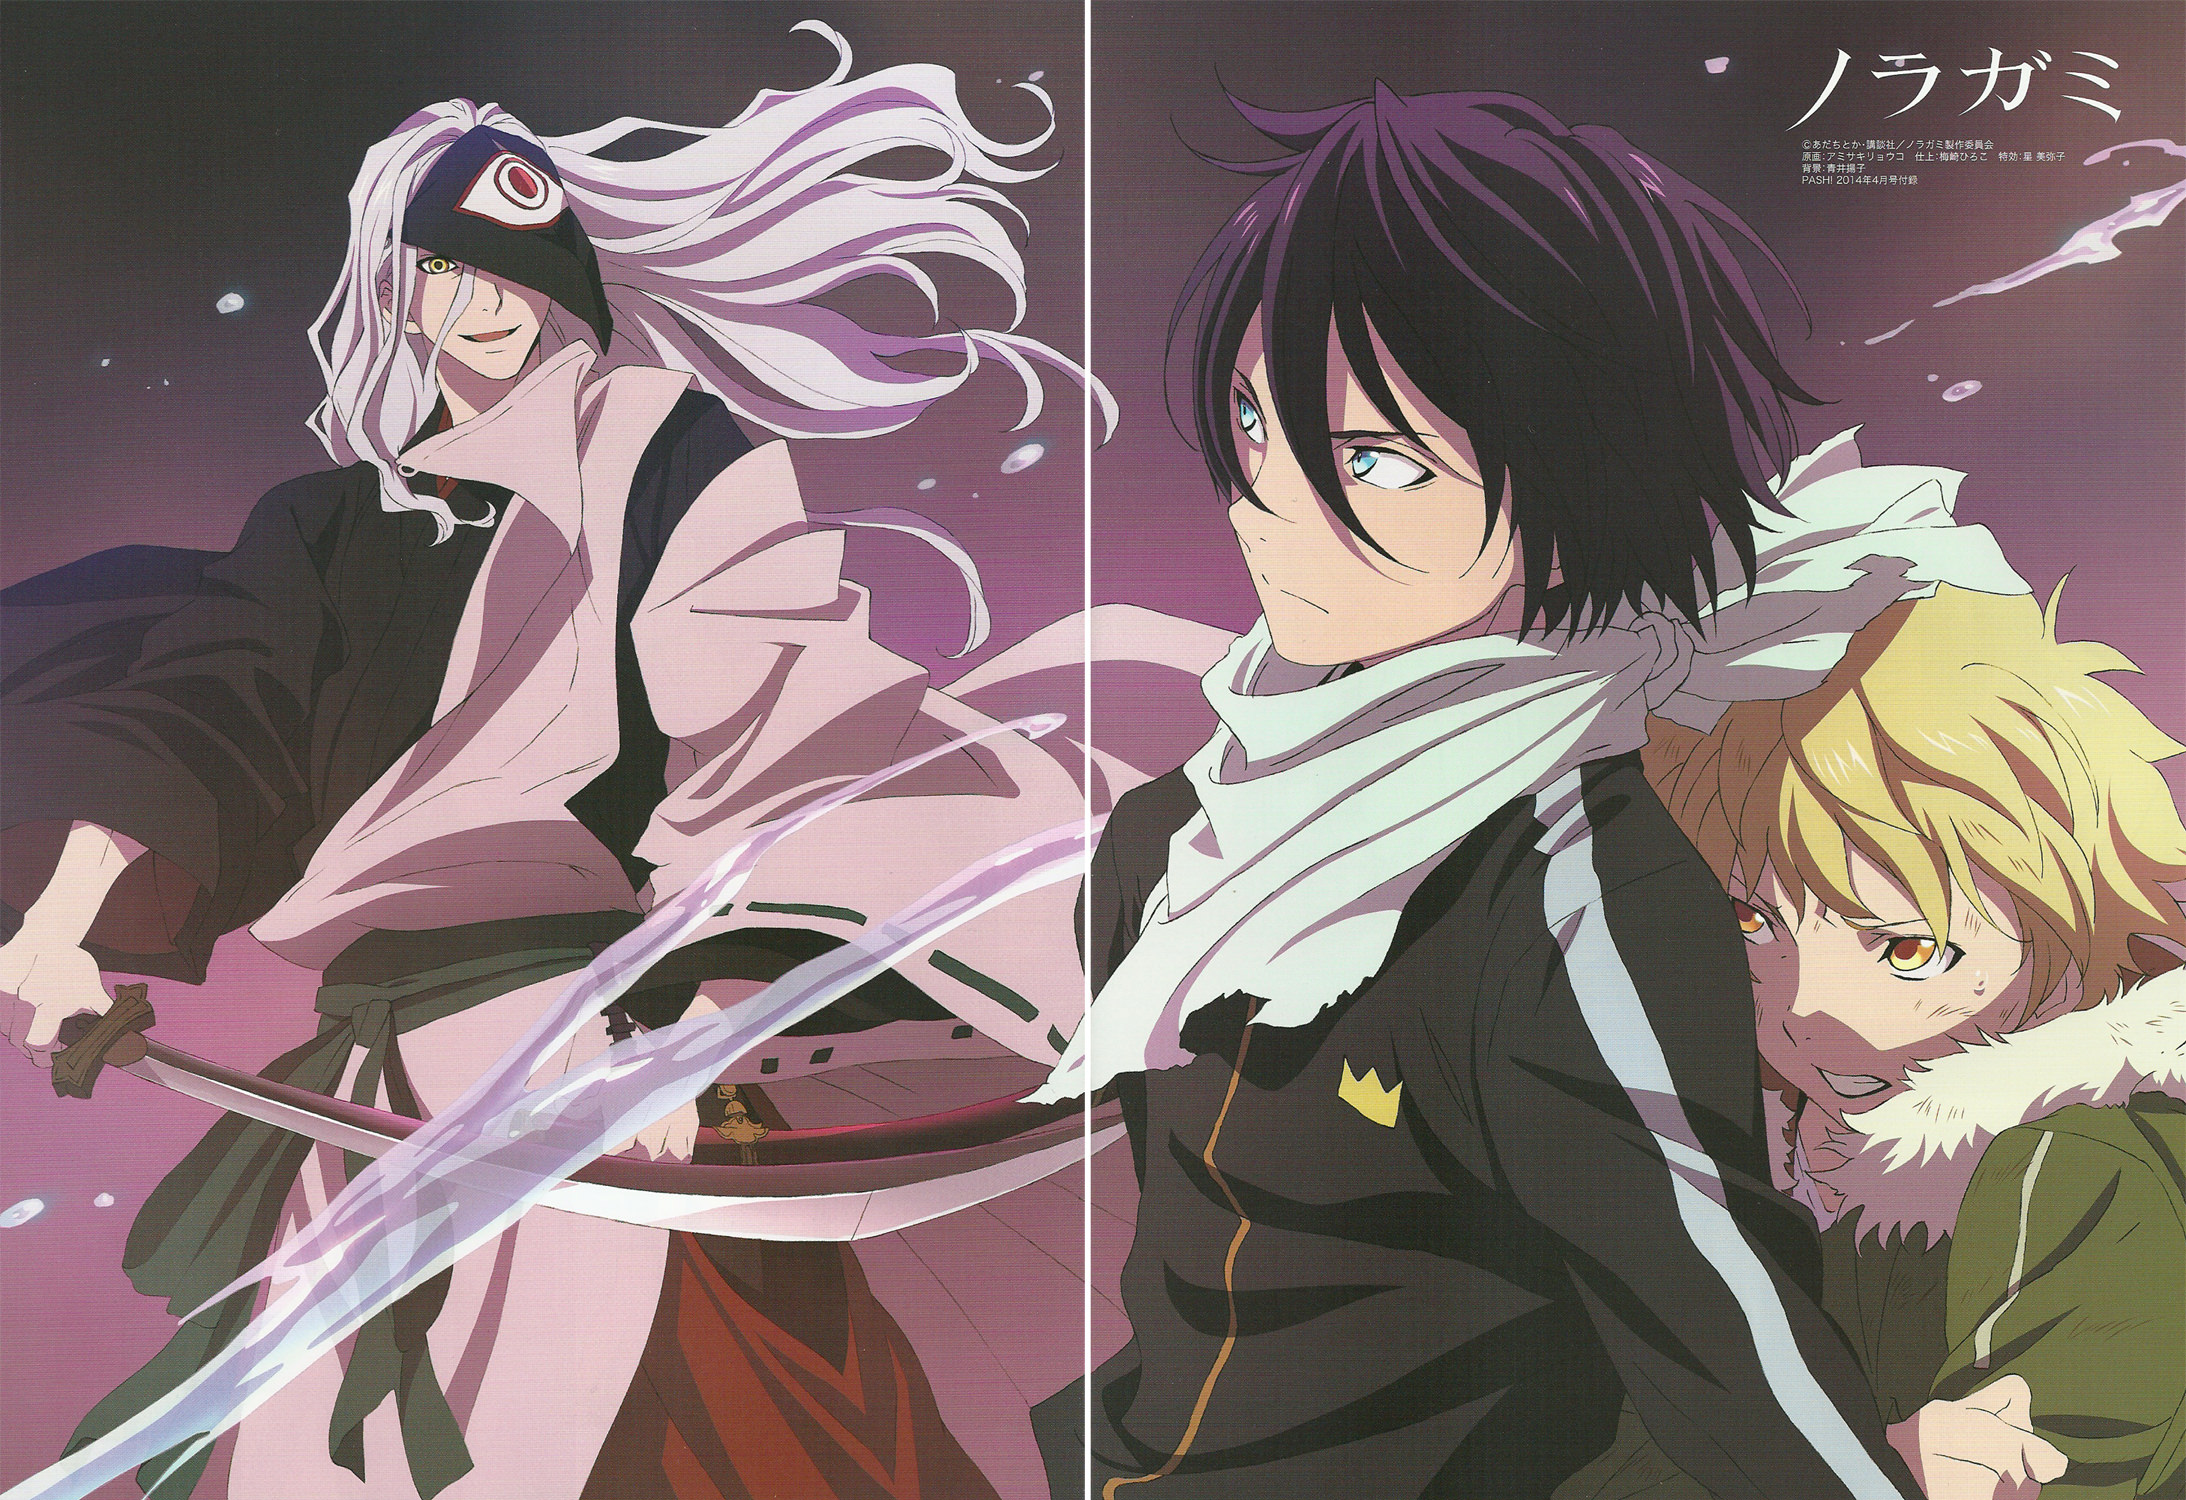 Yandere Anime Girl Wallpaper Noragami Yato Images 186 186 Yatogami 186 186 Hd Wallpaper And